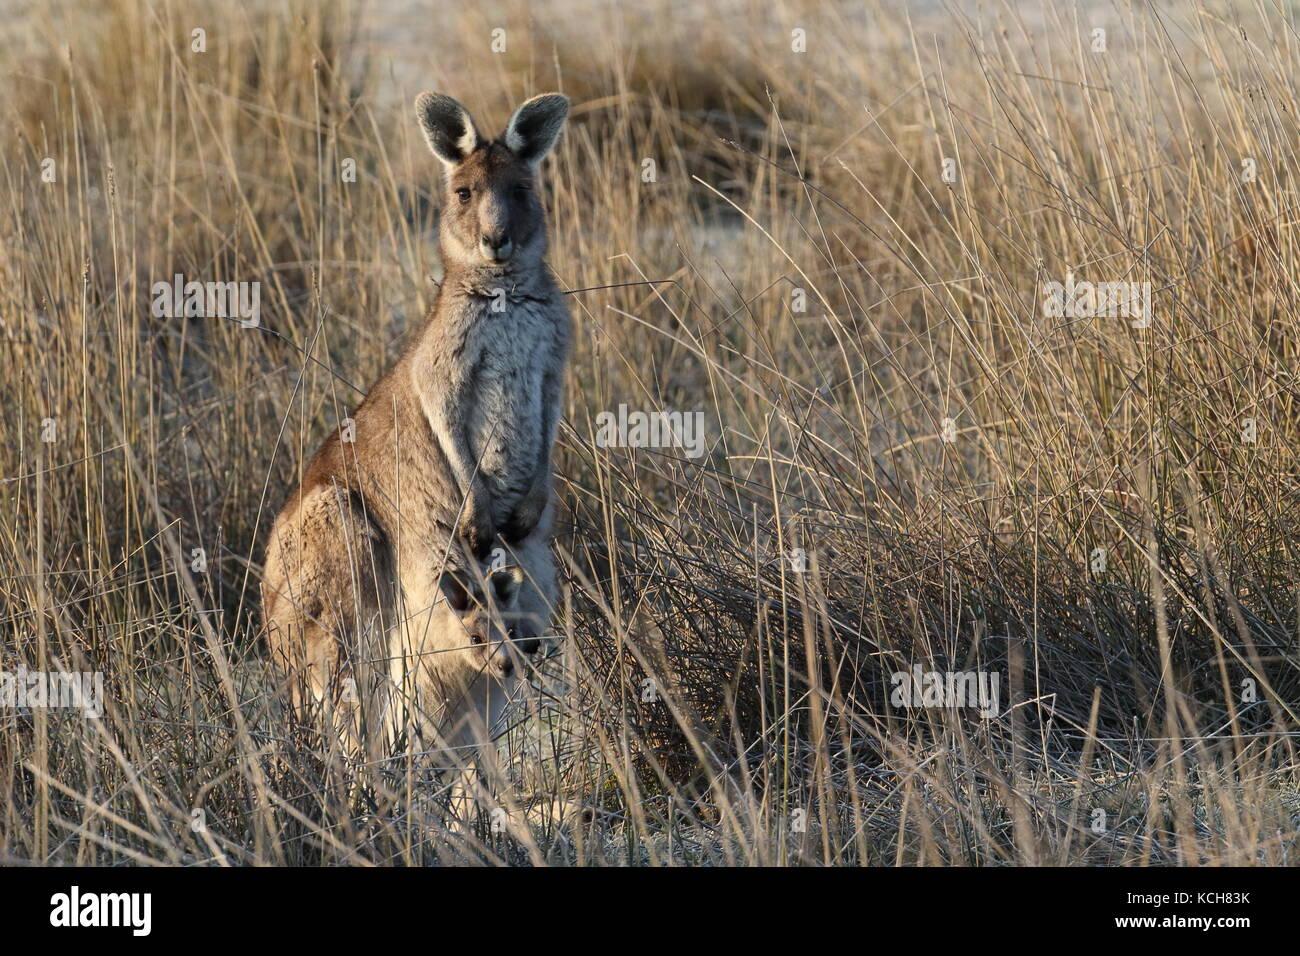 eastern grey kangaroo with pouch joey - Stock Image